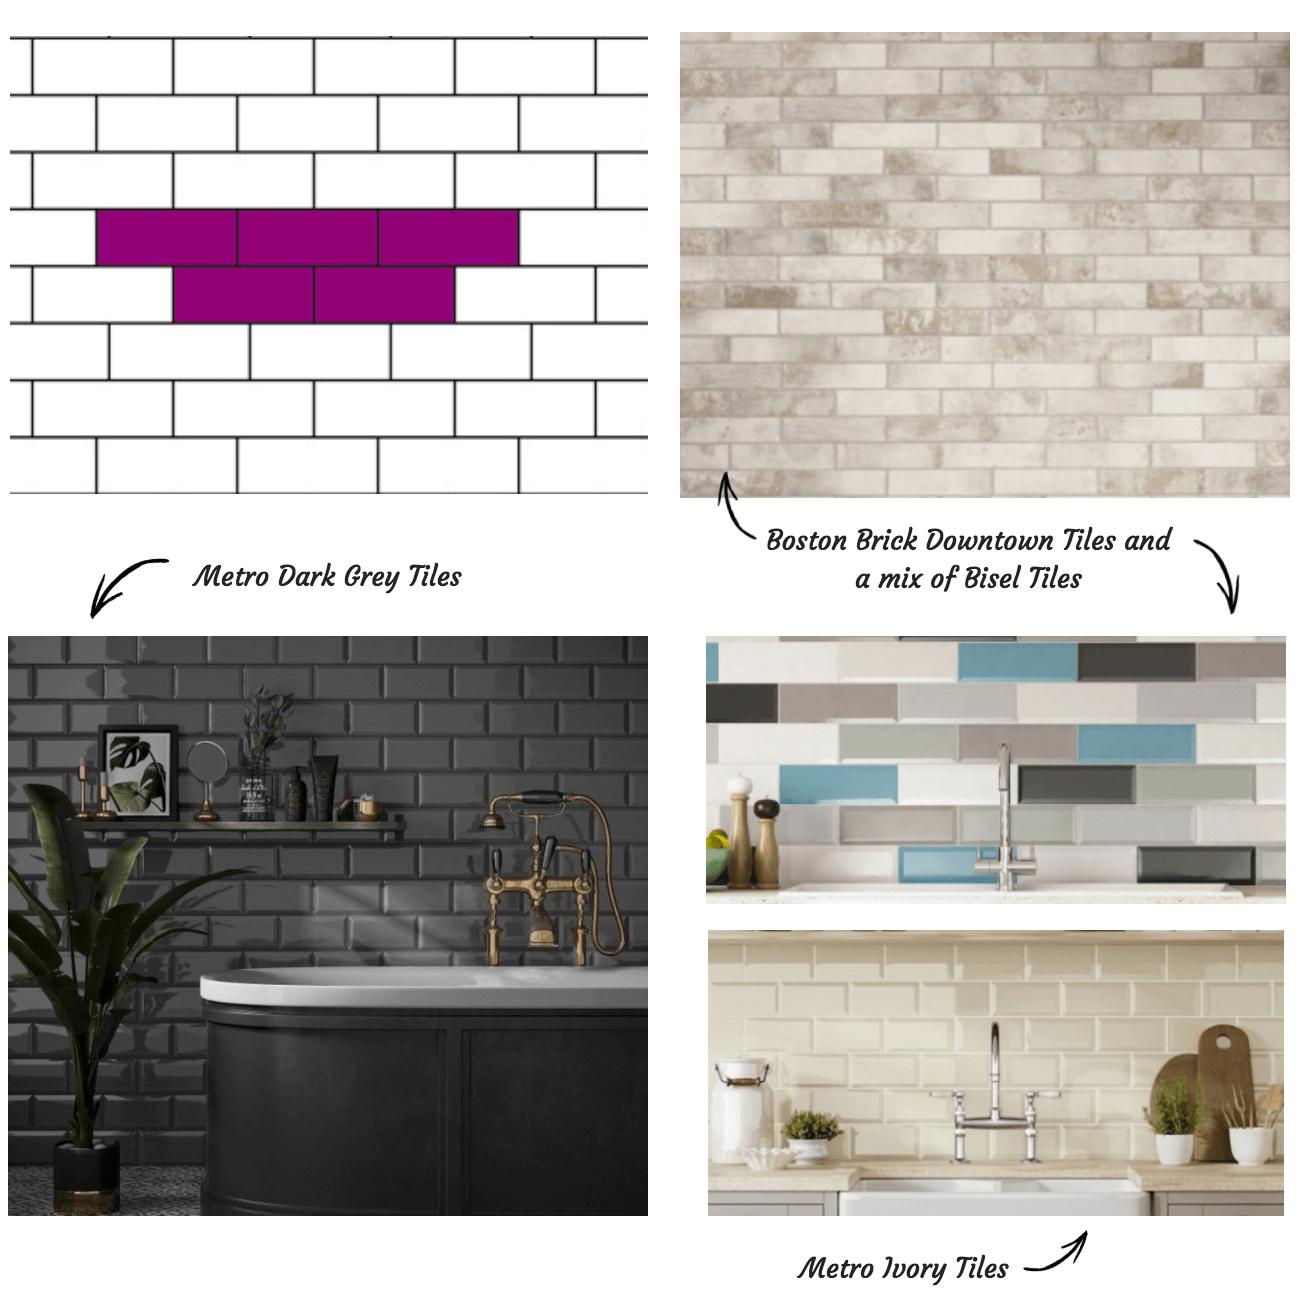 Brick Bond Tile Pattern